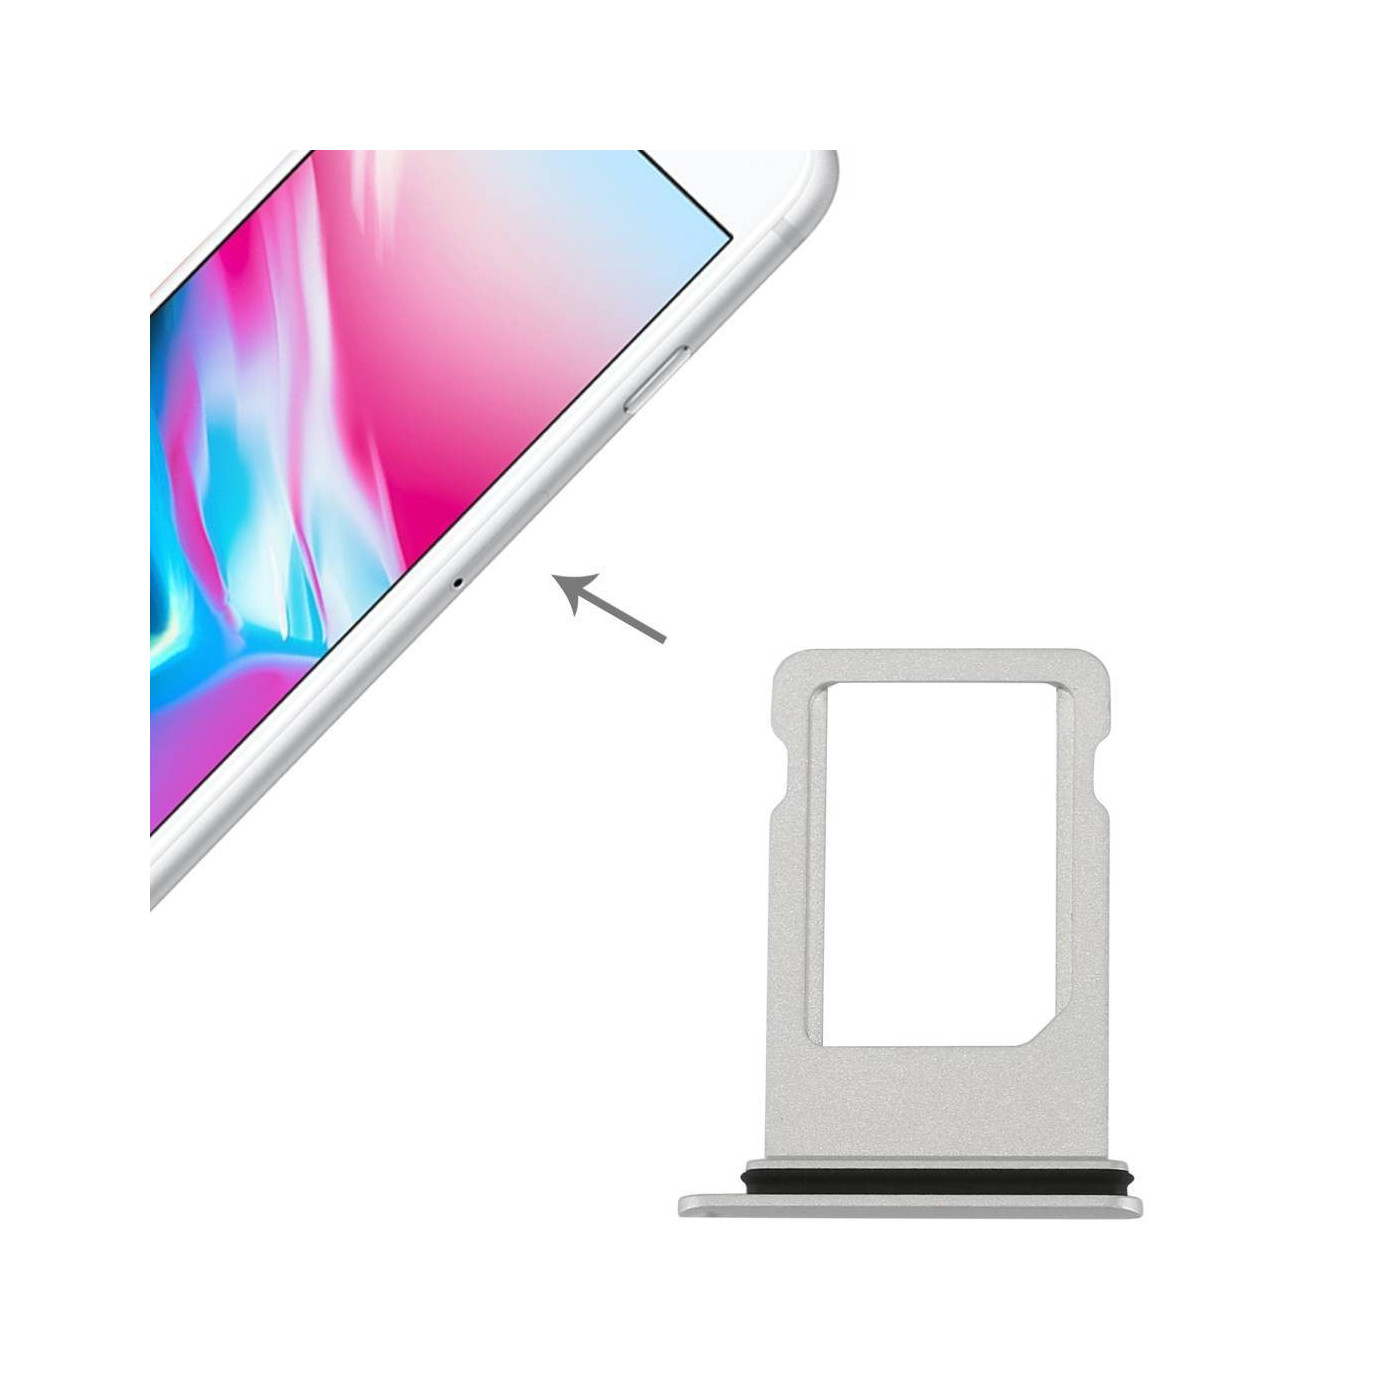 PORTA SIM SCHEDA Apple iPhone 8 SILVER SLOT SLITTA CARRELLO VASSOIO RICAMBIO